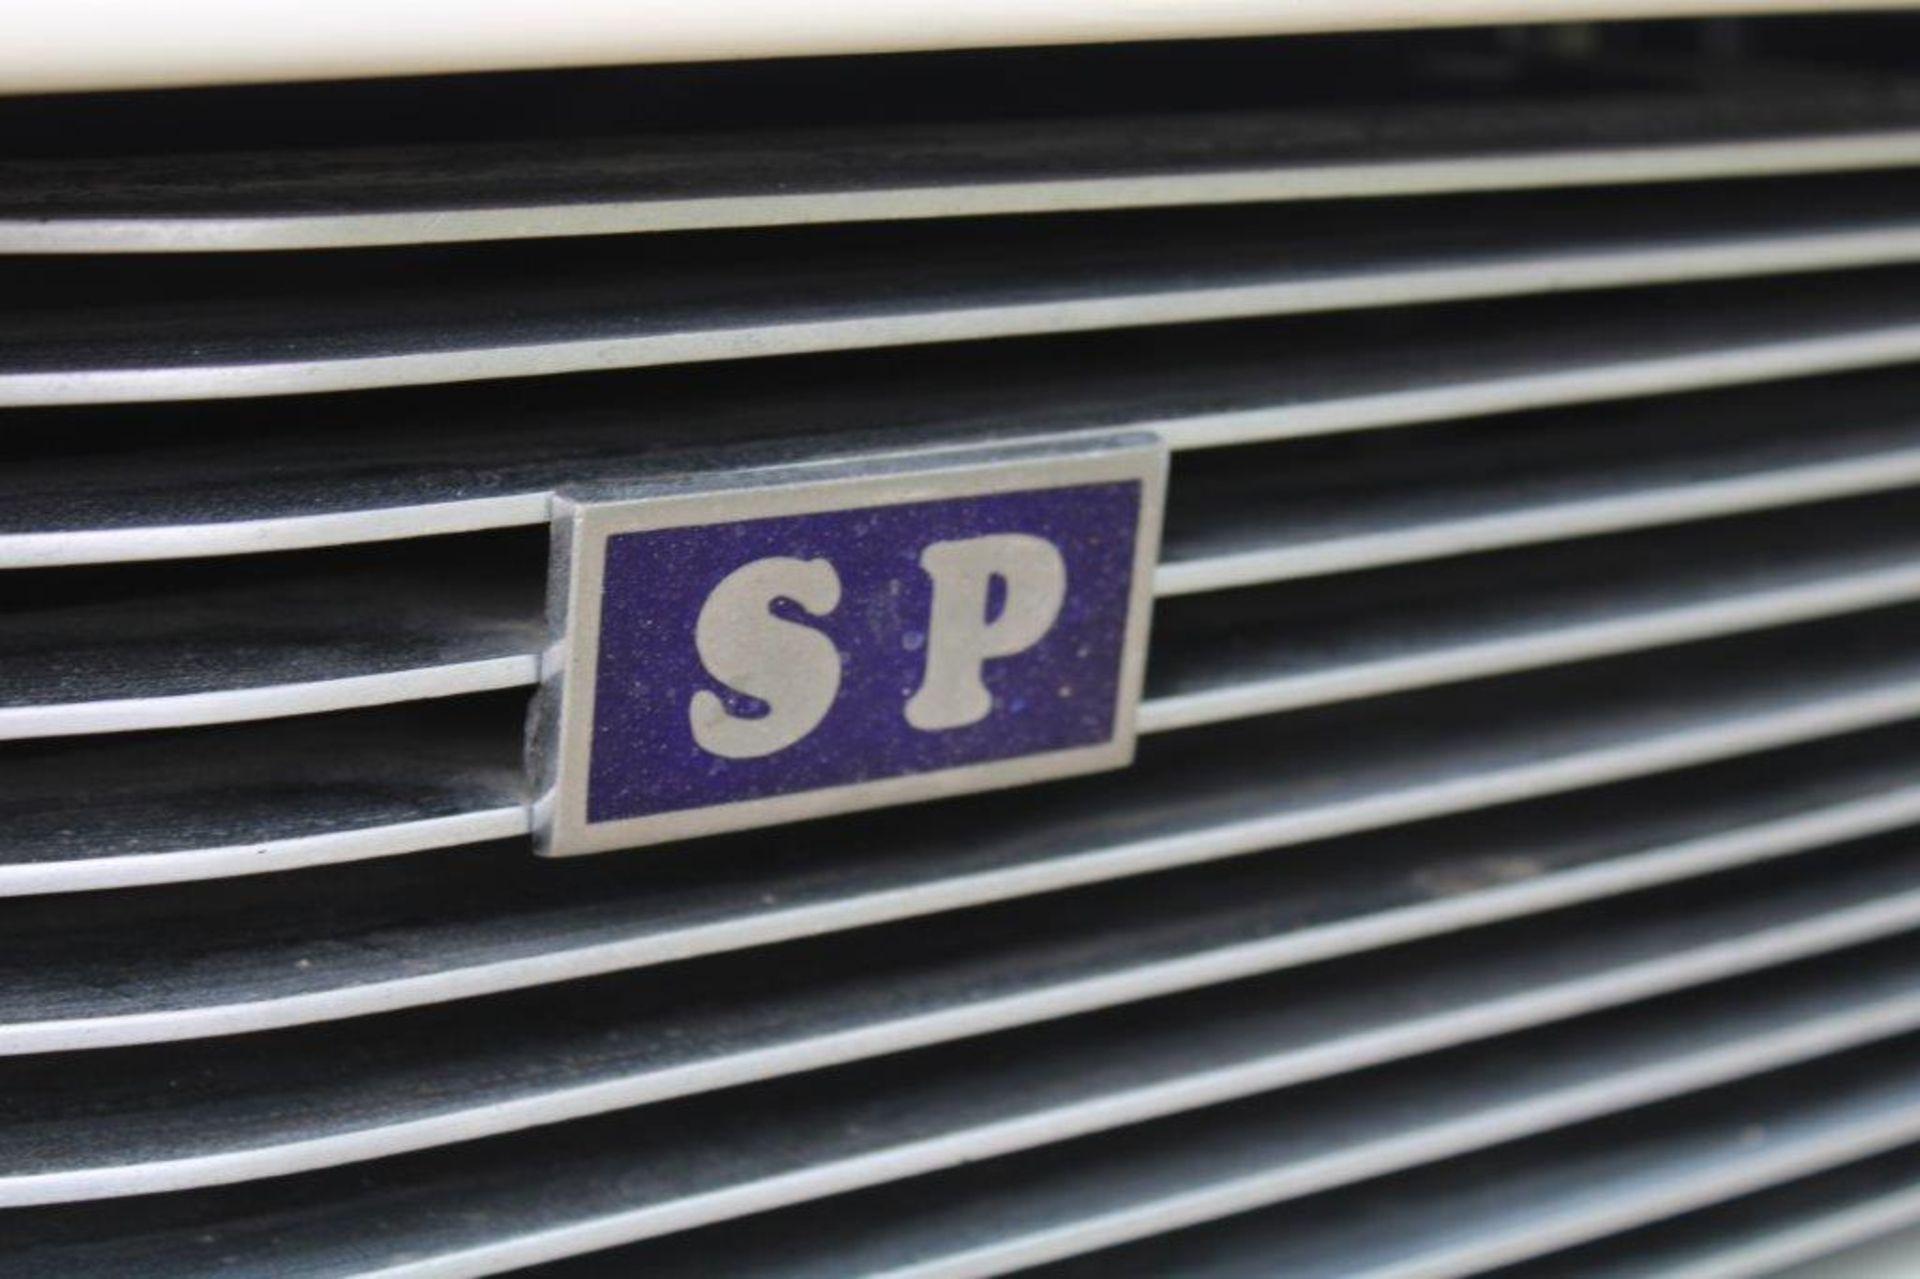 1972 Jensen Interceptor SP Auto - Image 26 of 32